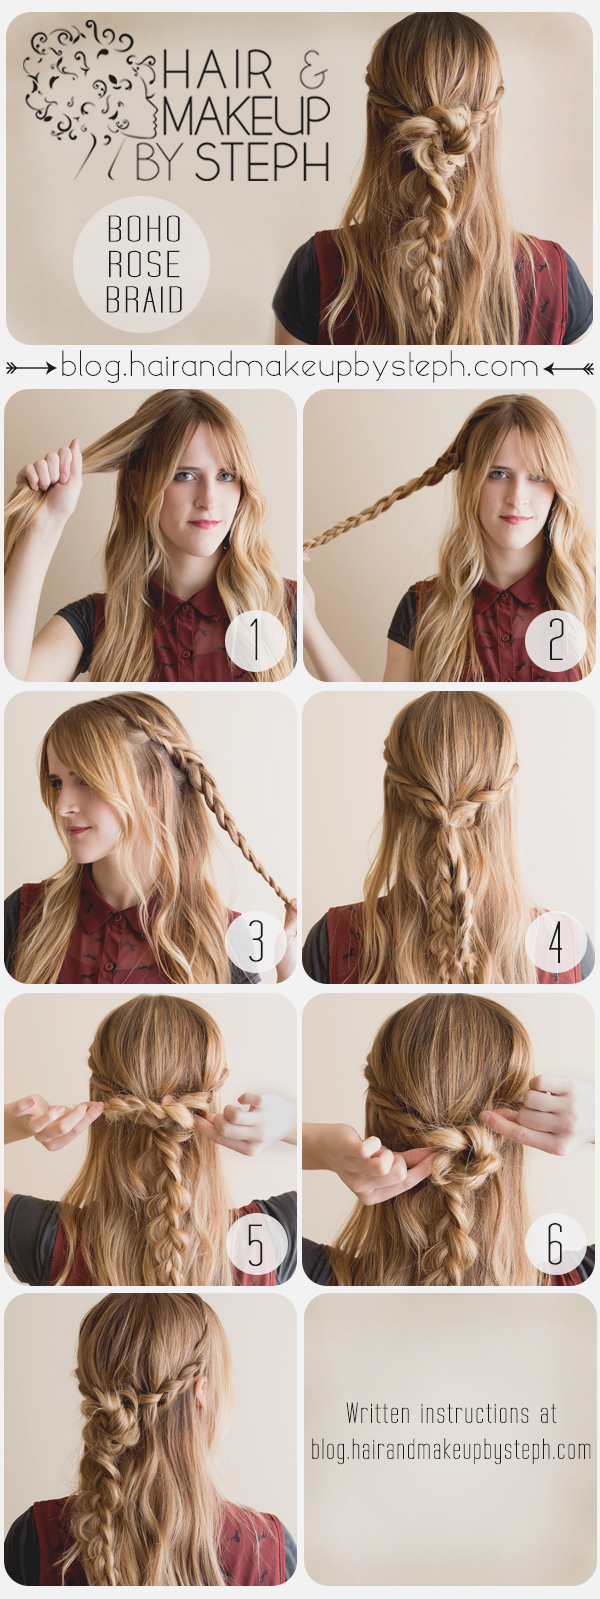 Pleasant Hair And Make Up By Steph Music Festival Series 3 Boho Rose Braid Short Hairstyles Gunalazisus